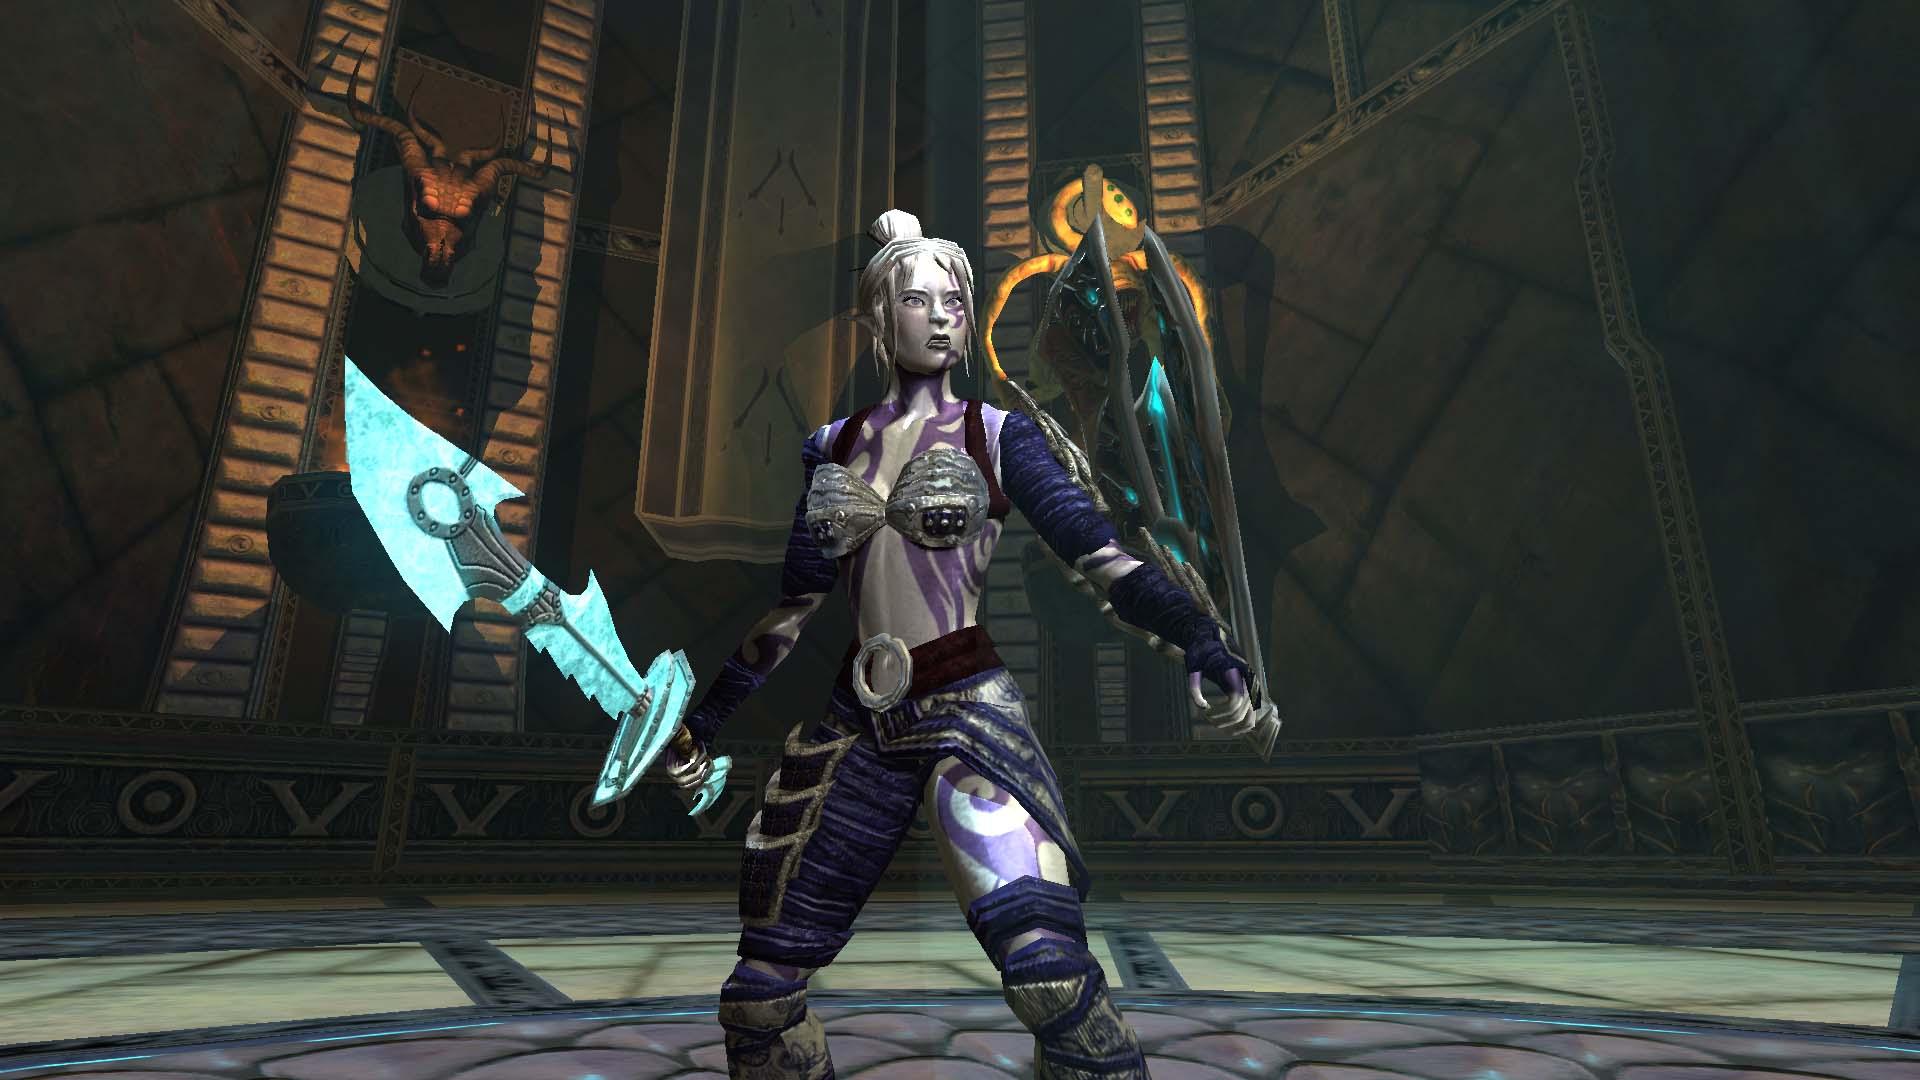 GameBanshee - Games - EverQuest II: Destiny of Velious